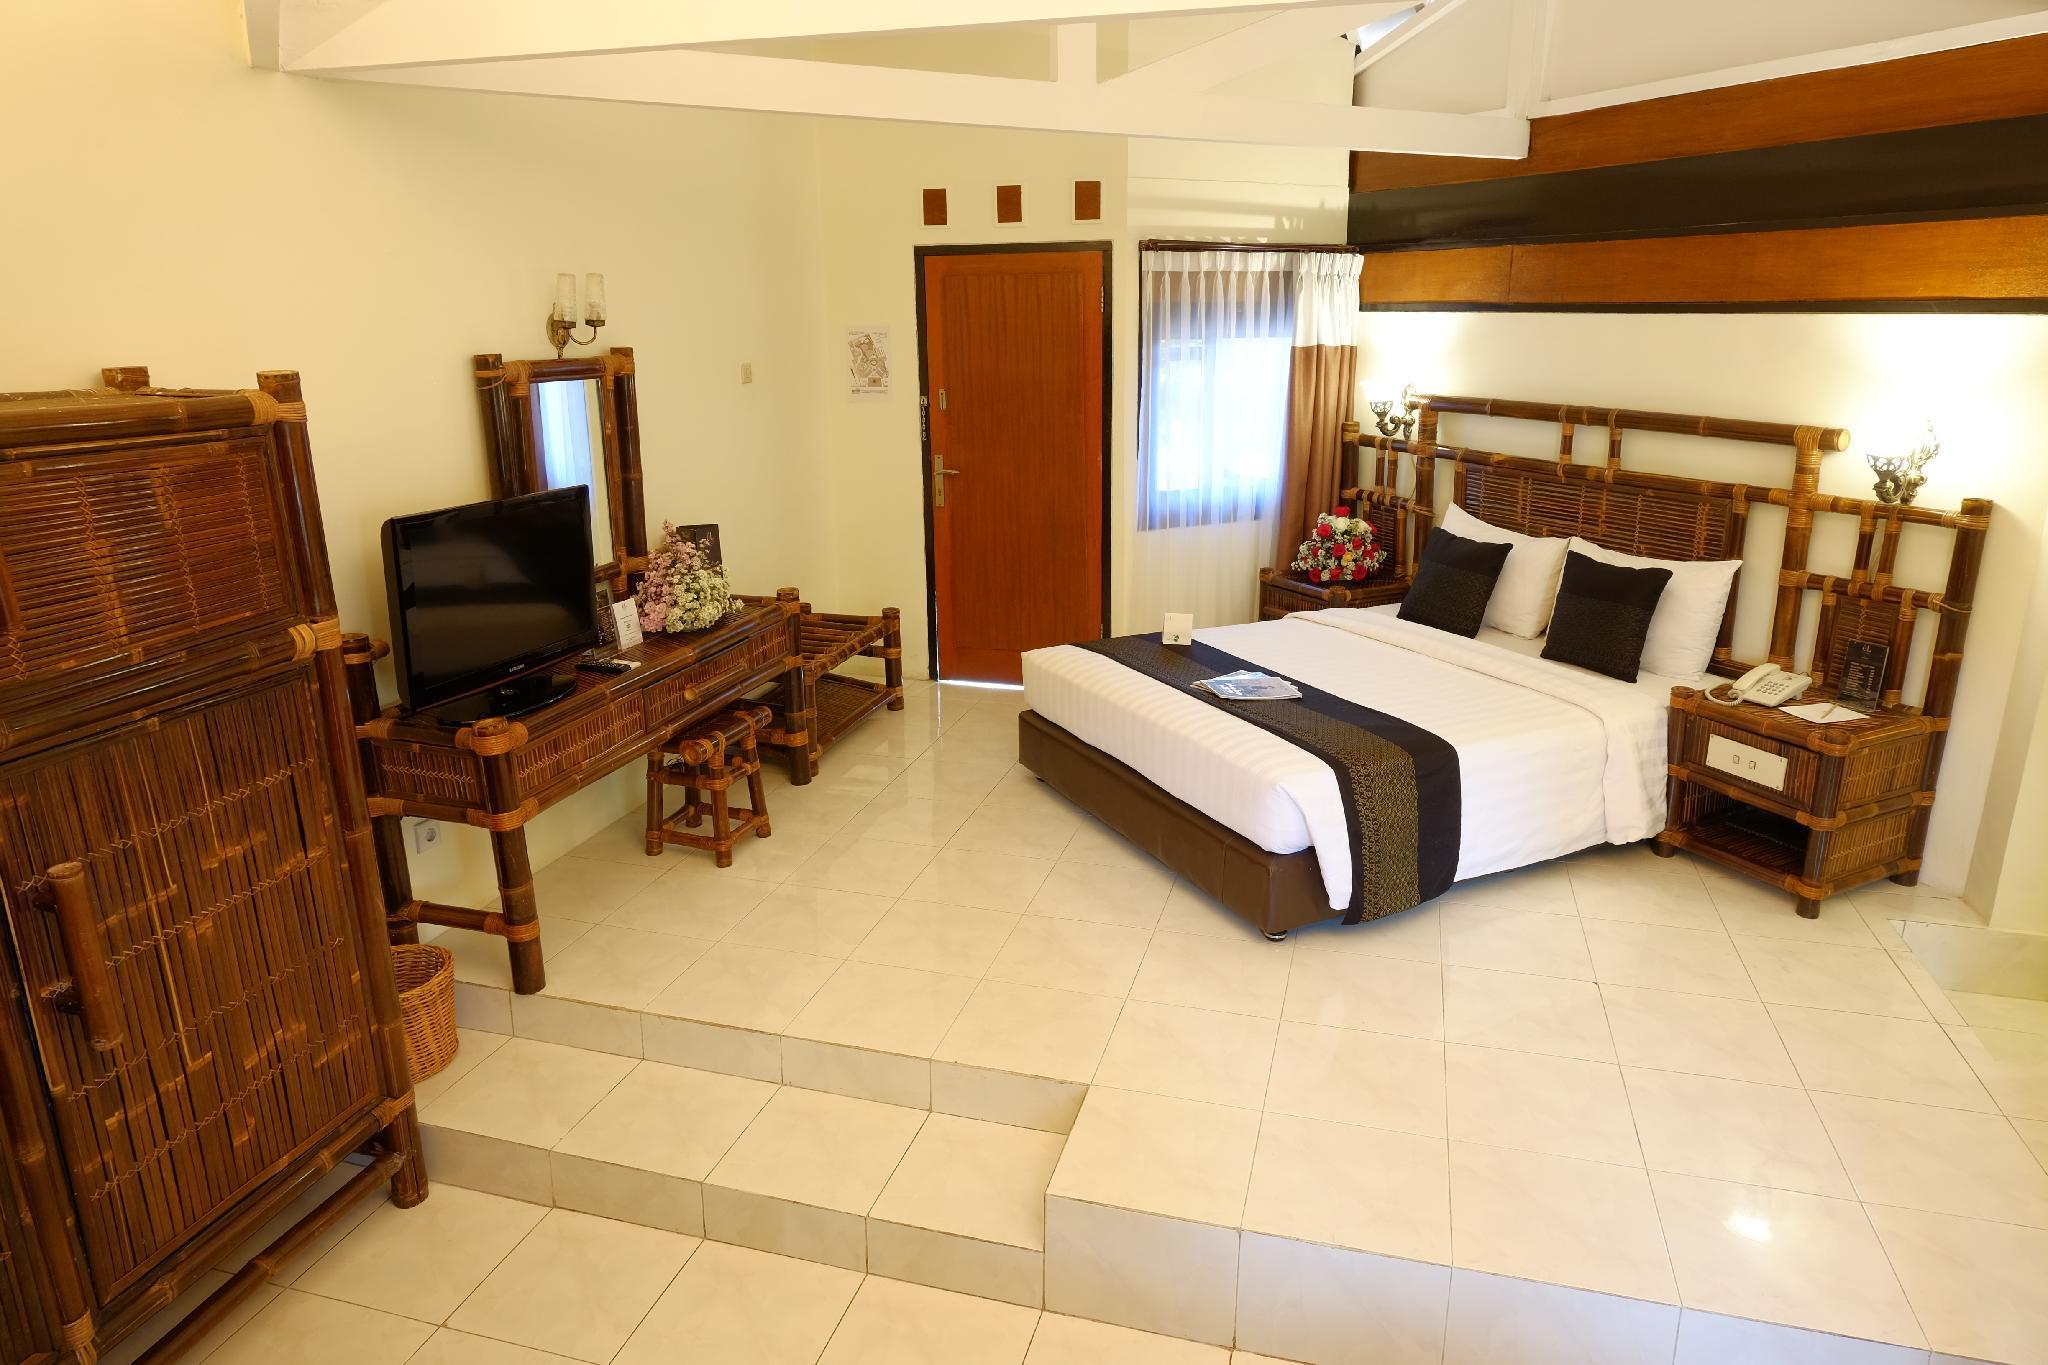 eL Hotel Kartika Wijaya Batu